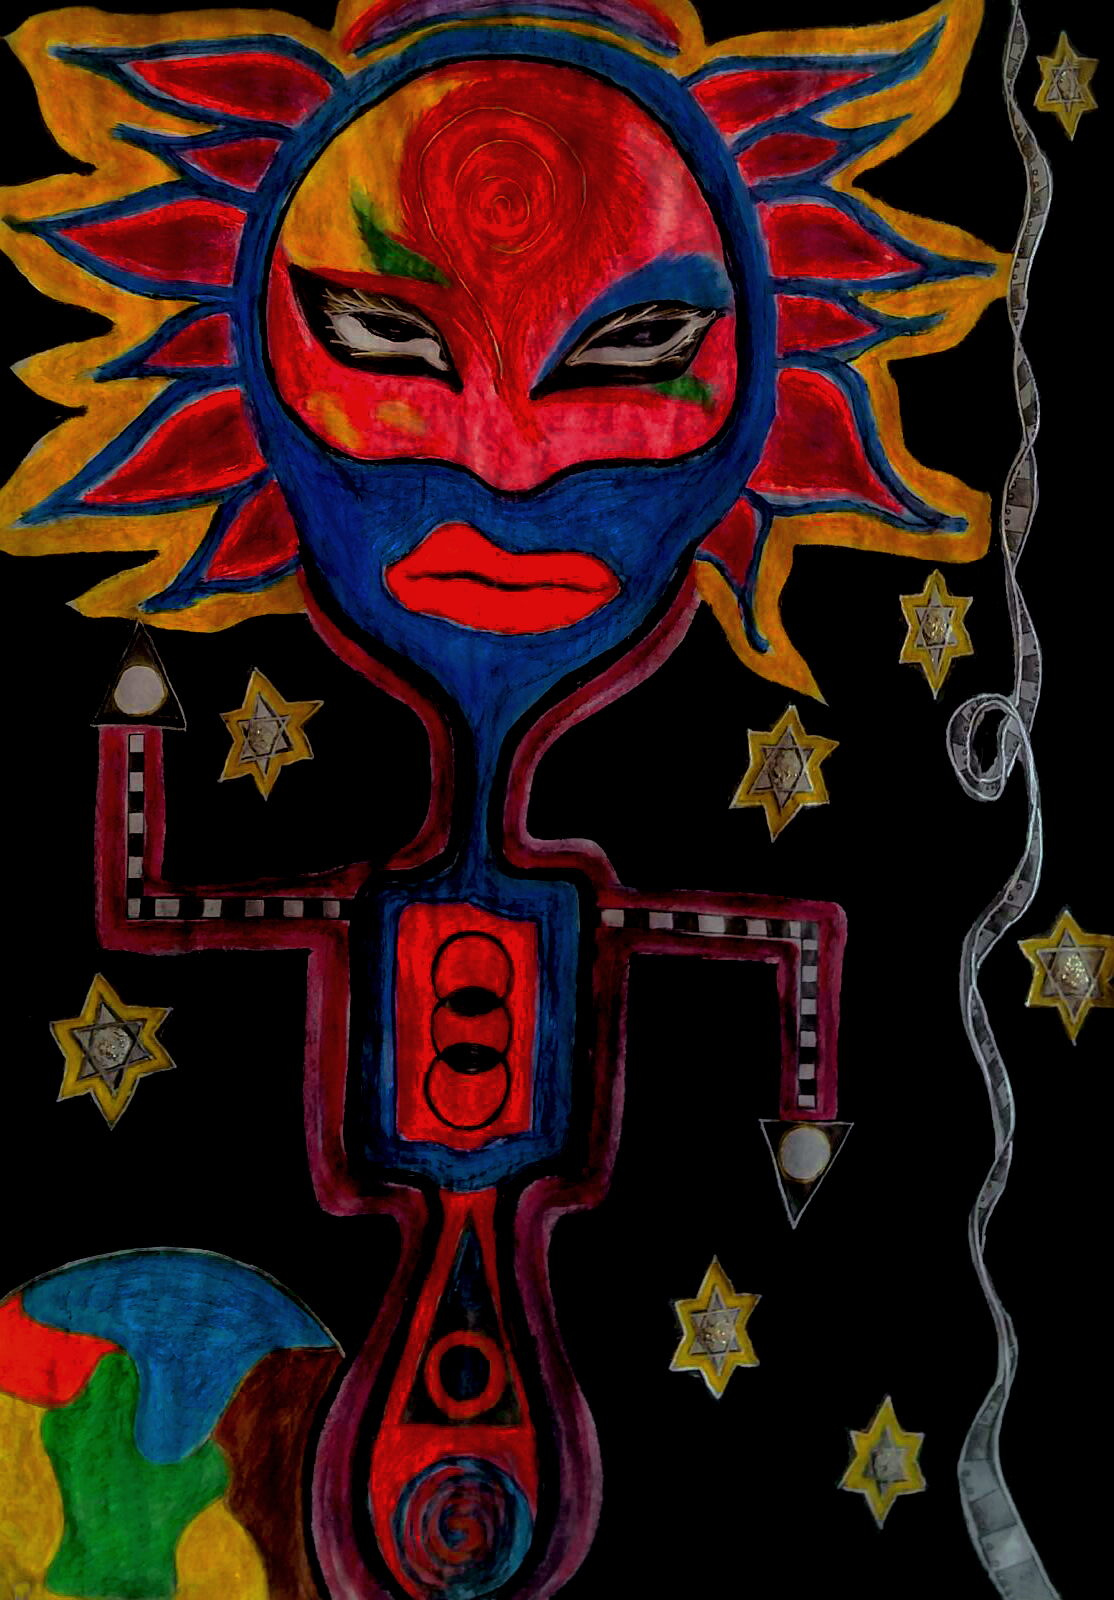 The Astrocat.